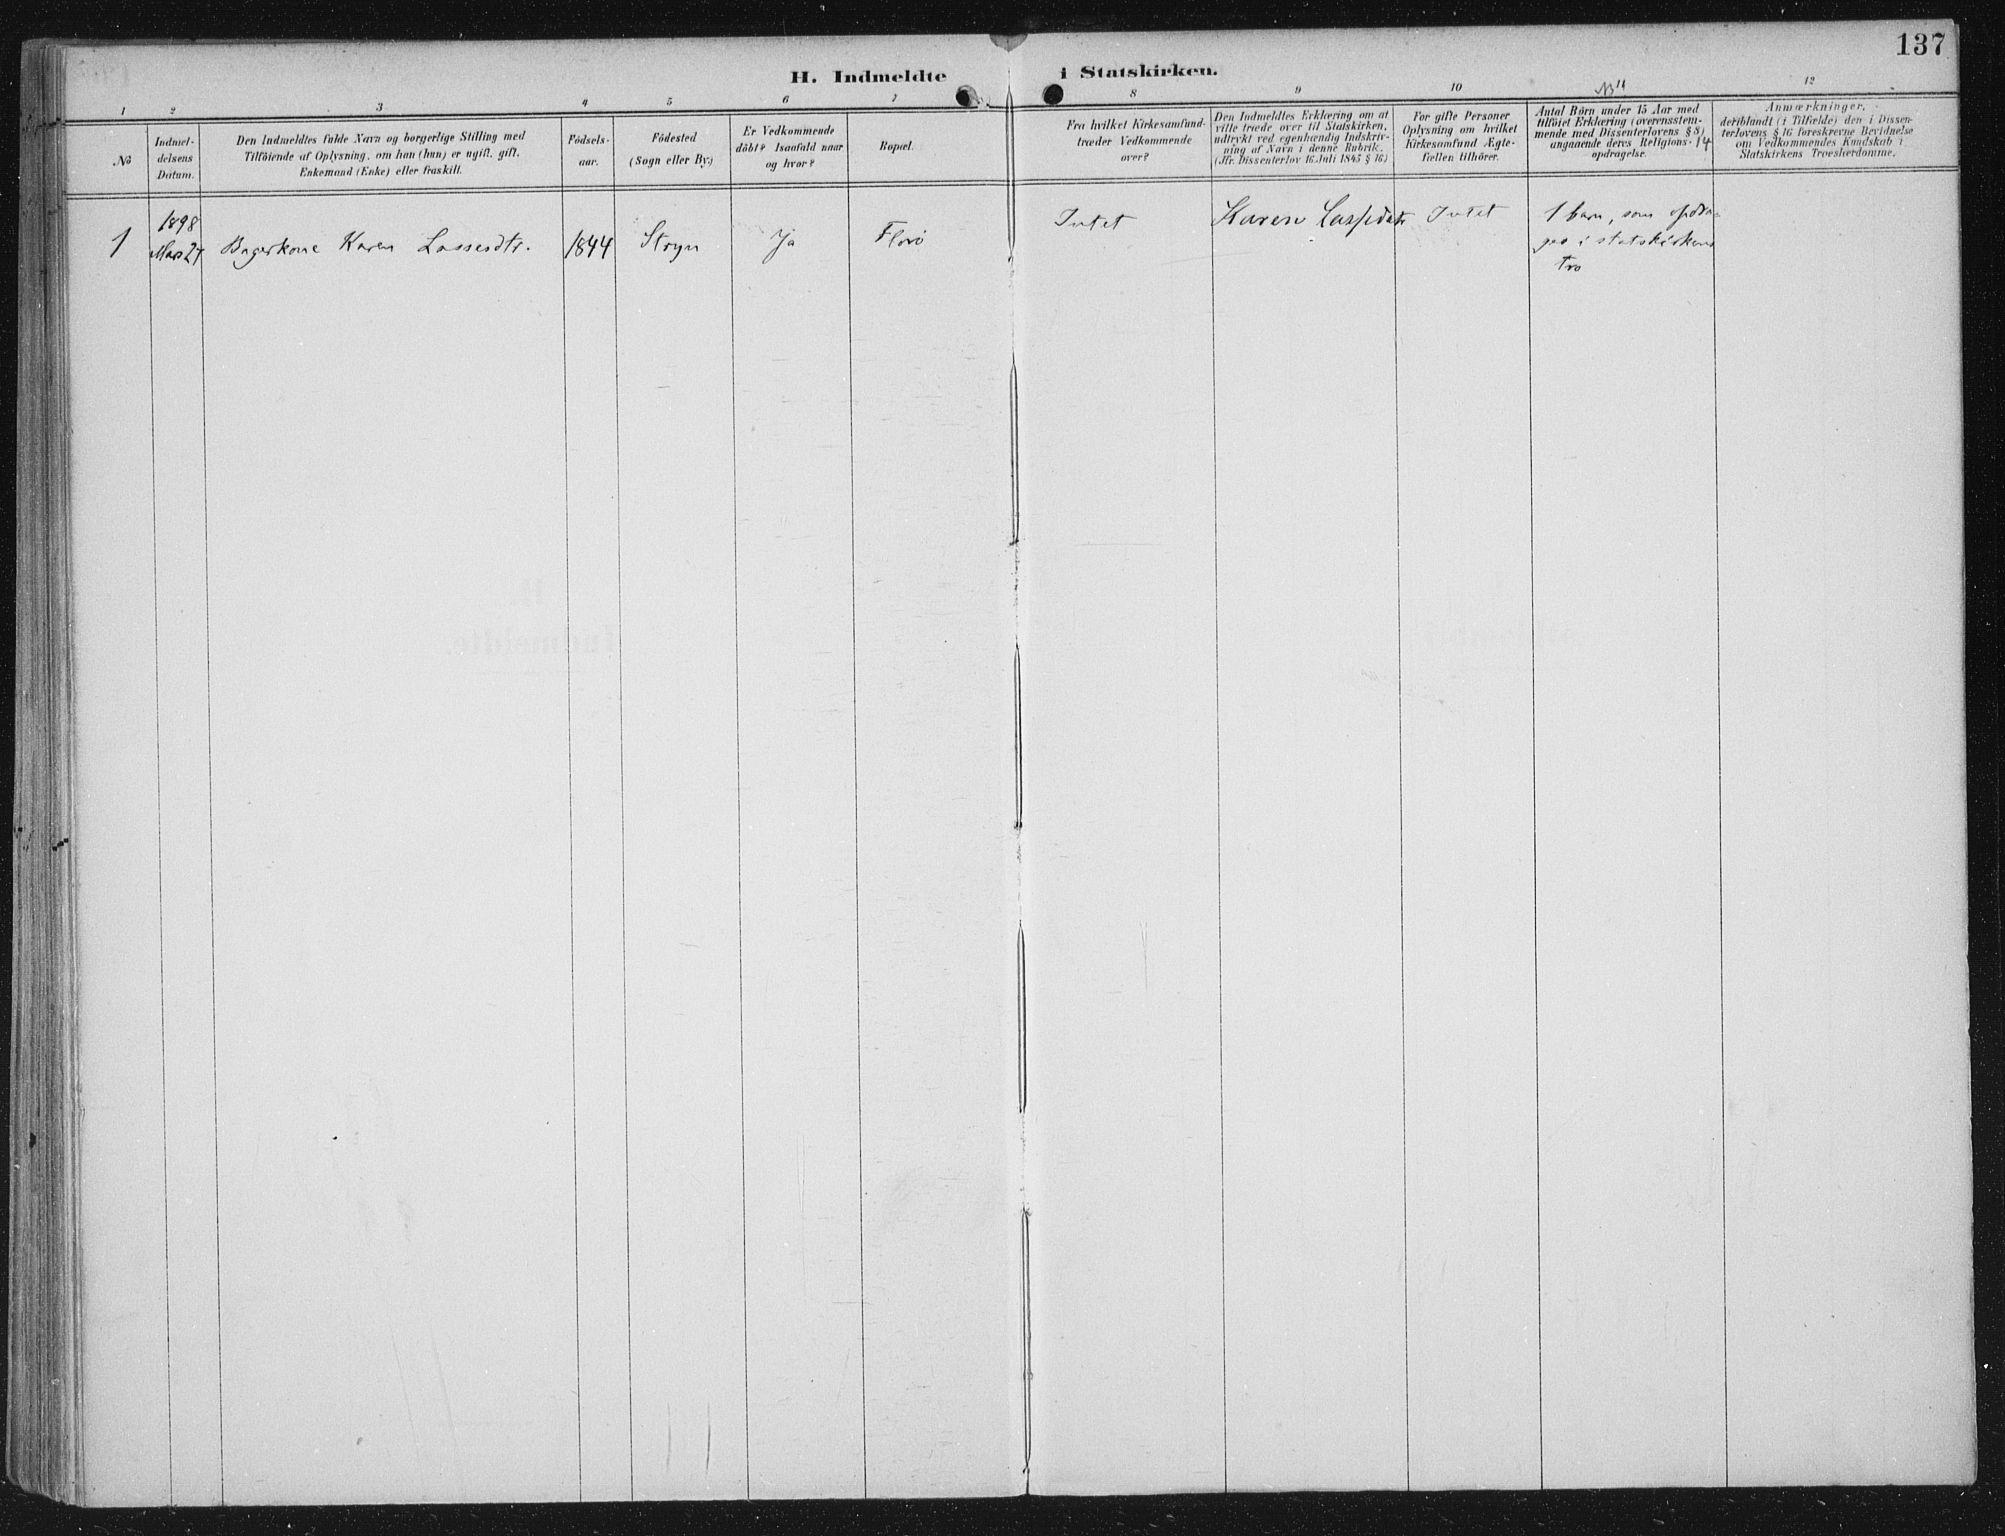 SAB, Kinn sokneprestembete, H/Haa/Haac/L0002: Ministerialbok nr. C  2, 1895-1916, s. 137